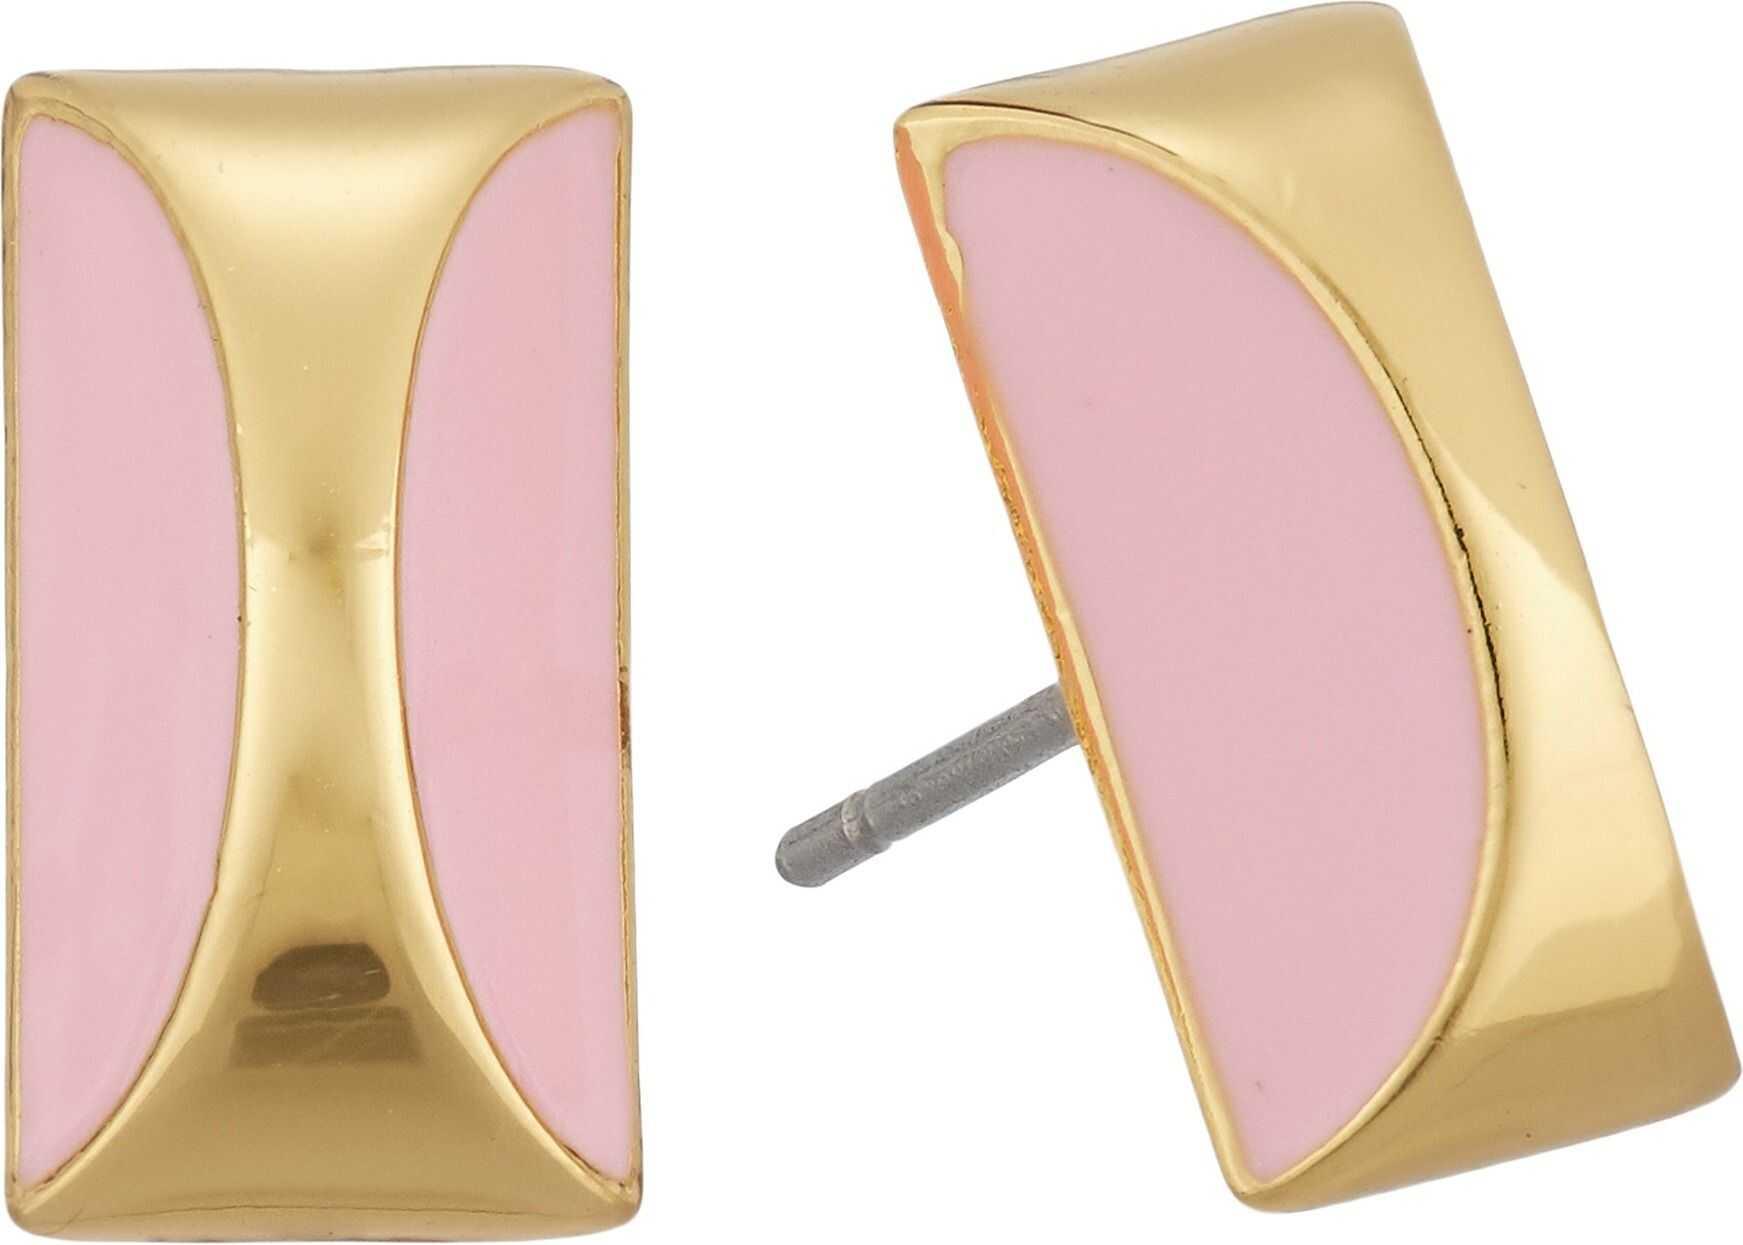 Kate Spade New York Sliced Scallops Studs Earrings Pink